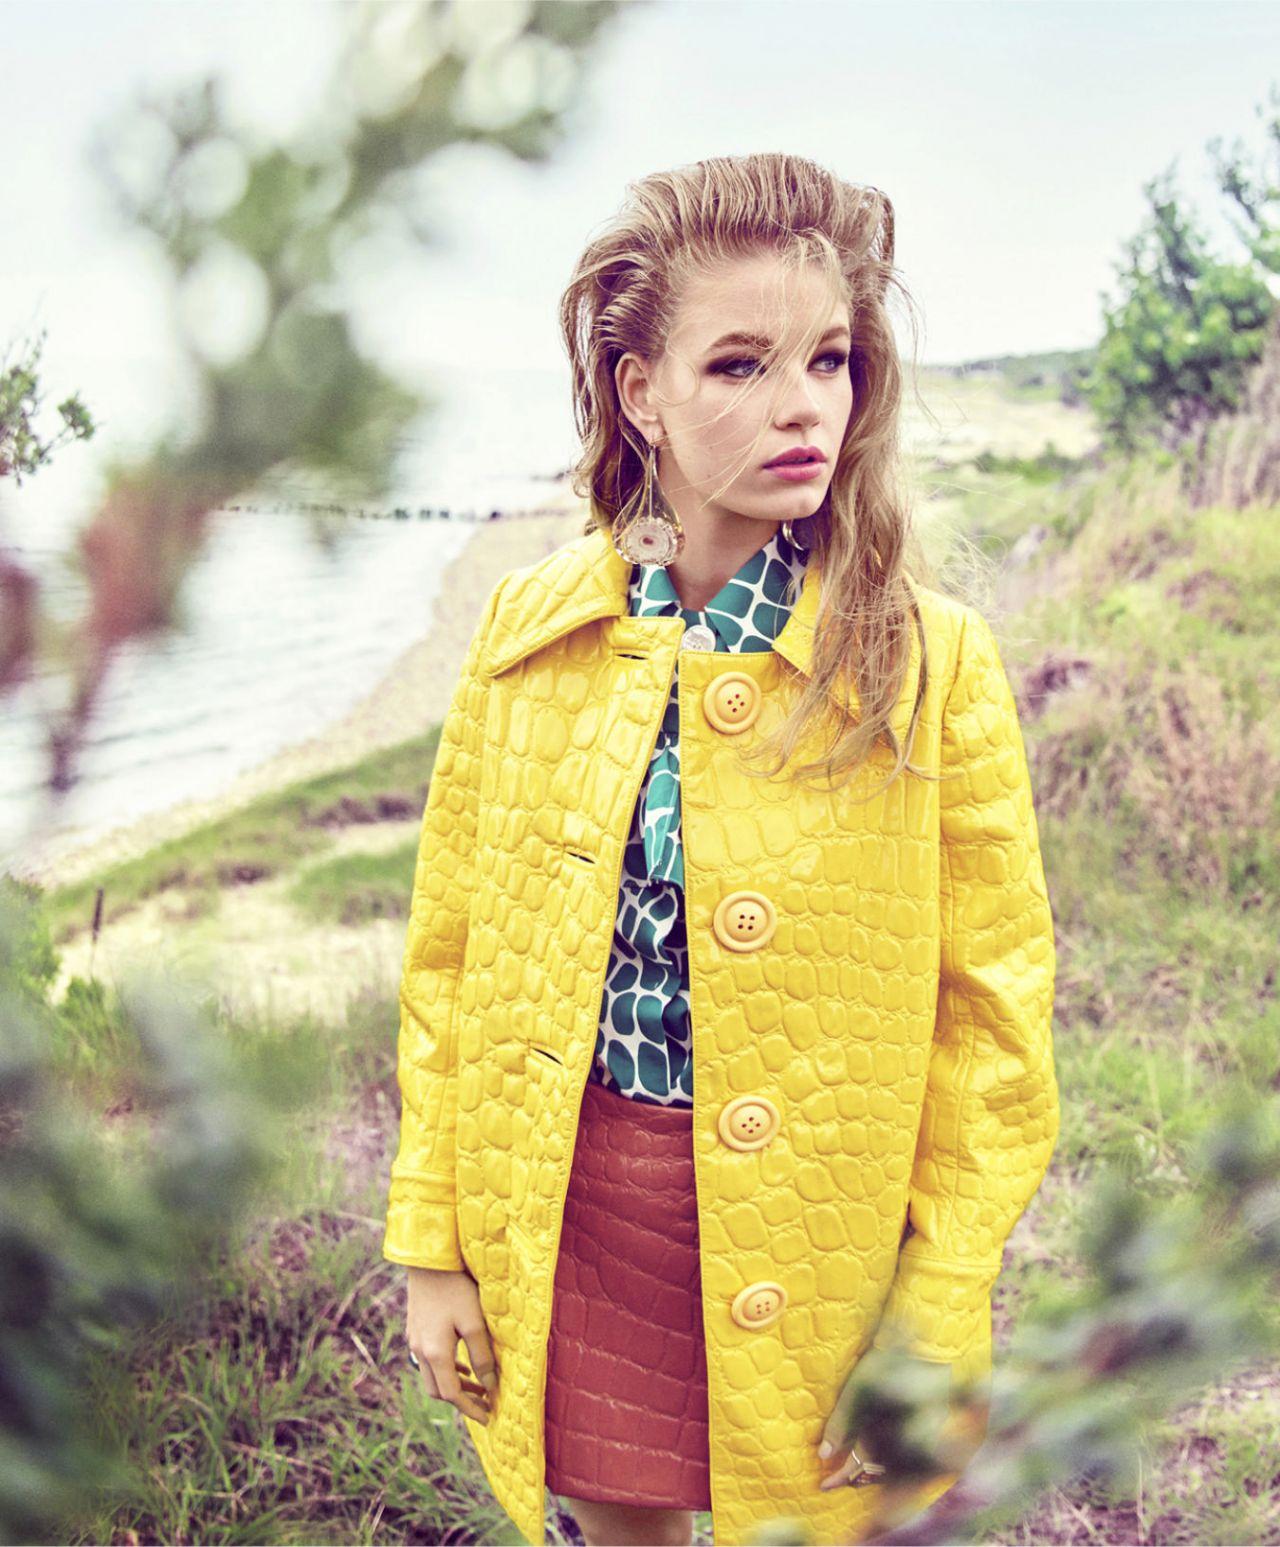 0fbde004127f Holly May Saker - Photoshoot for Harper s Bazaar US October 2015